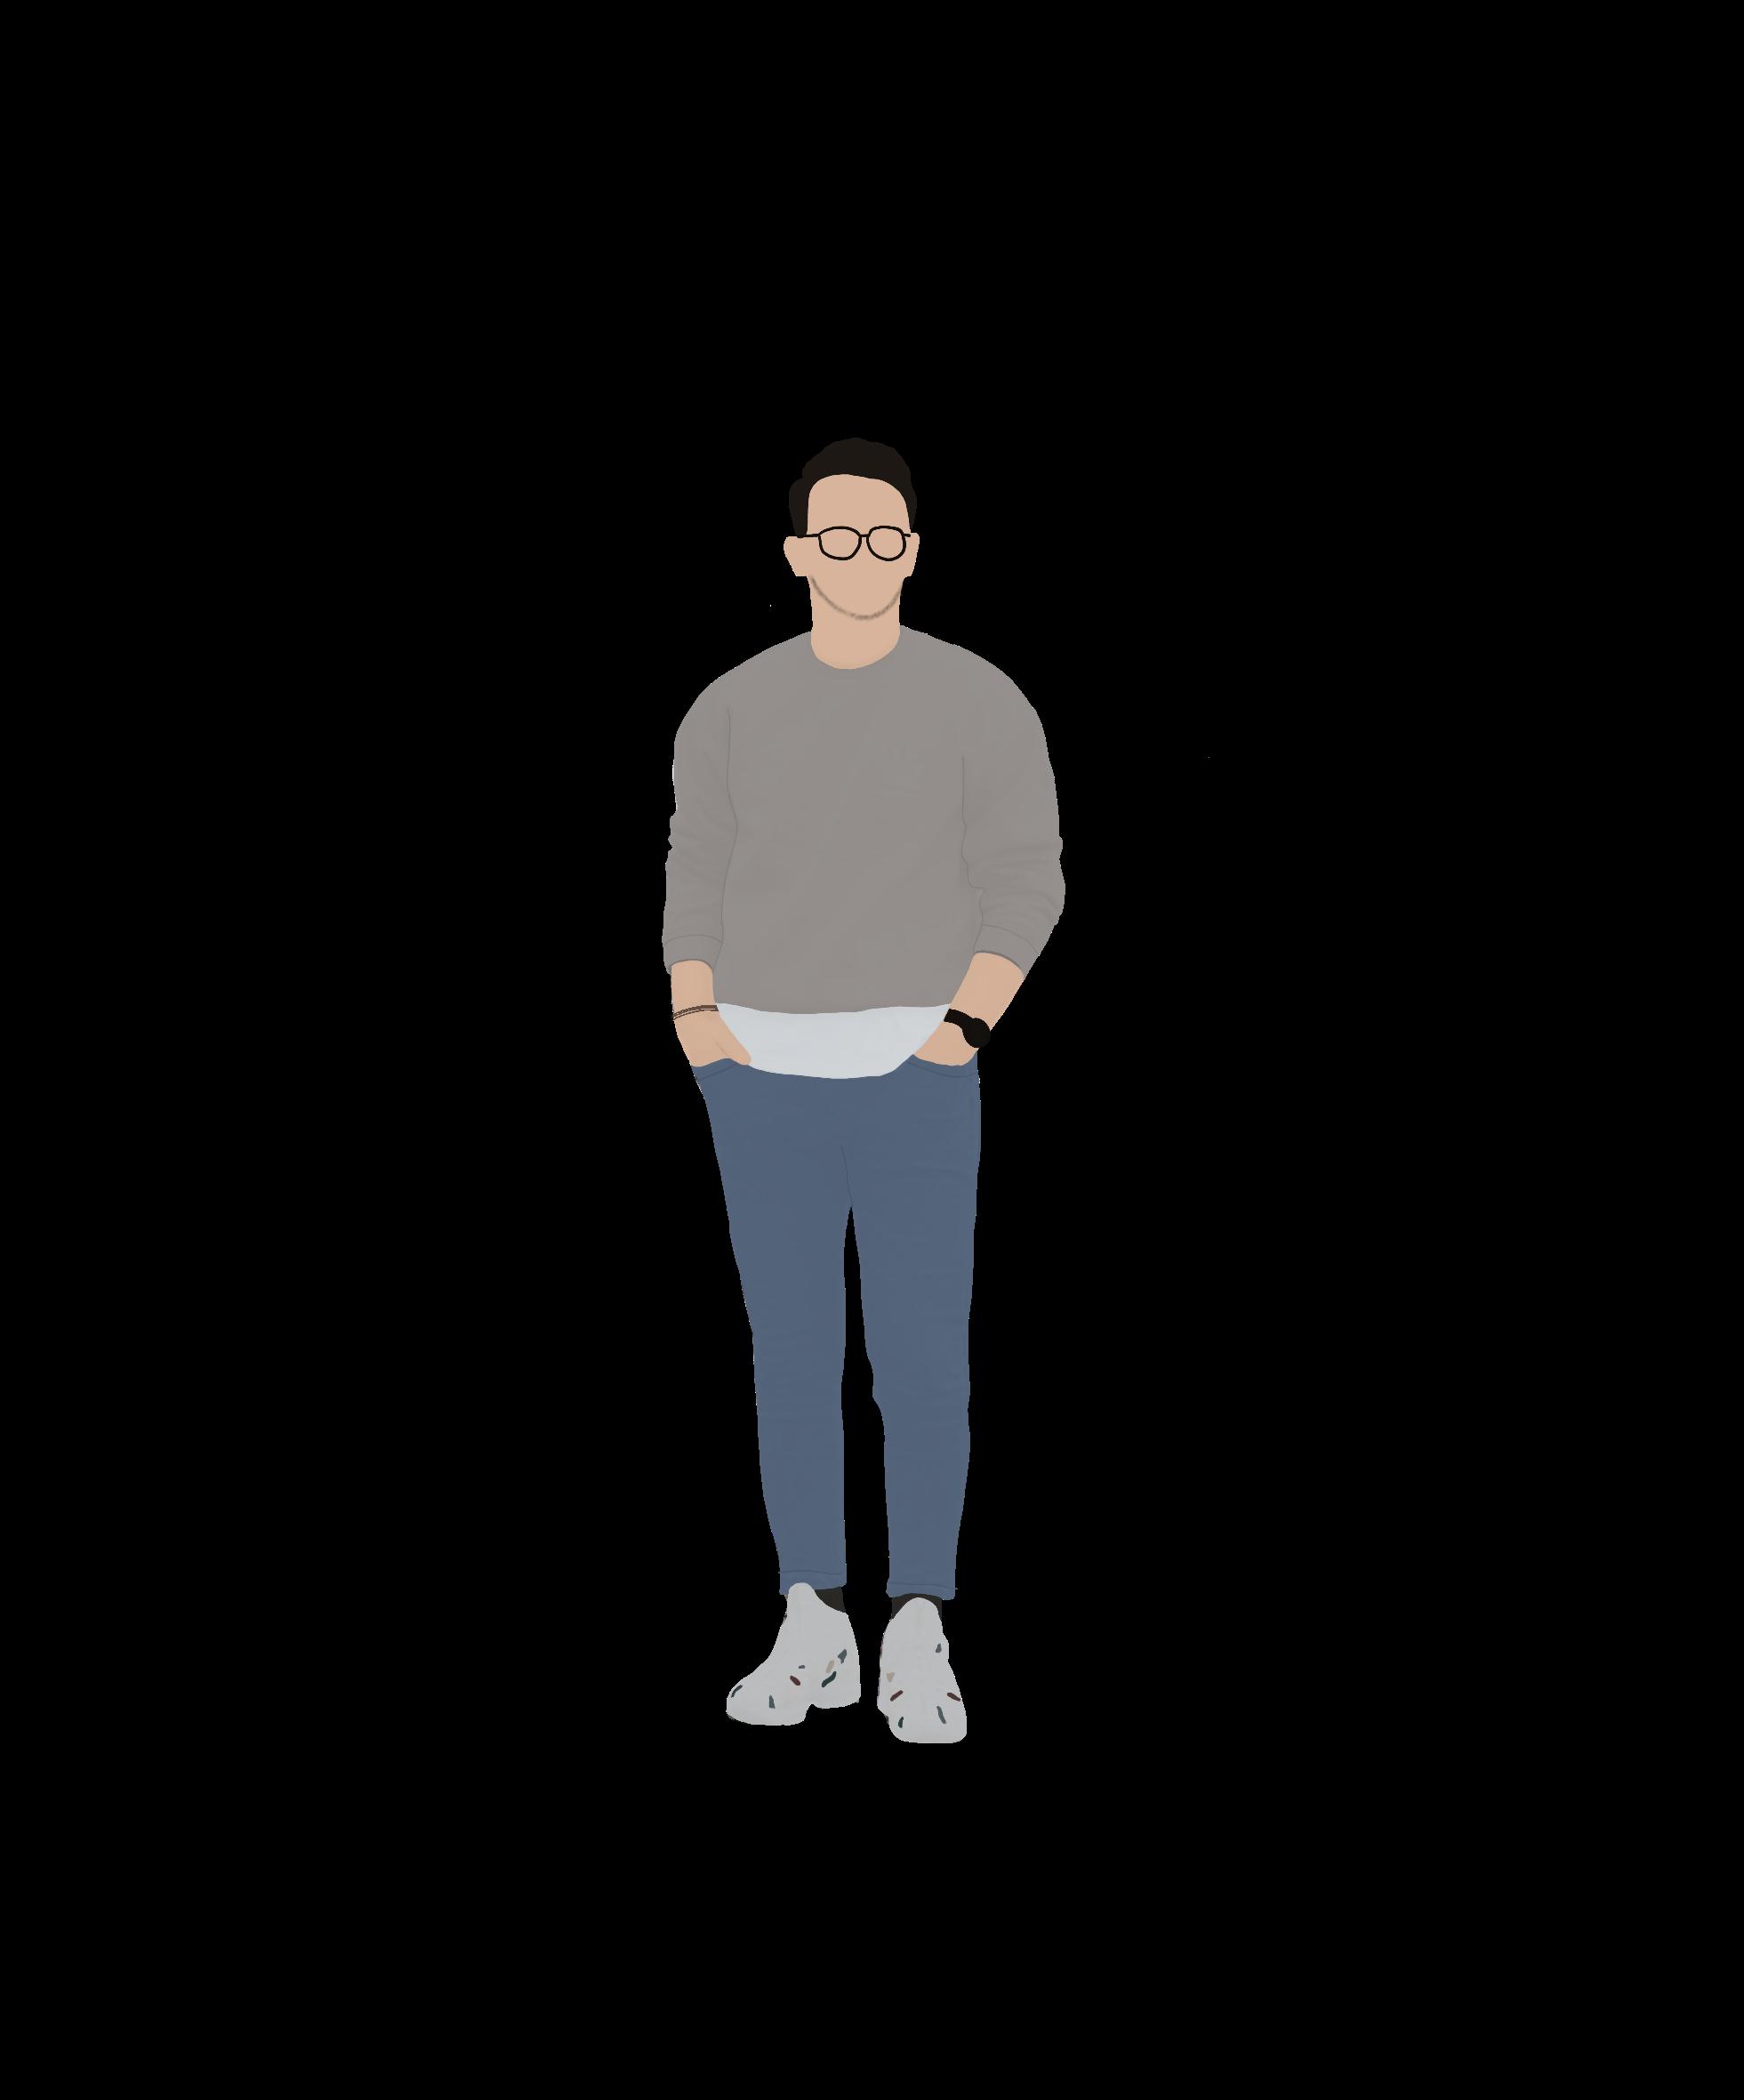 Human Scale Architecture Illustration Em 2020 Ilustracao De Pessoas Photoshop Ilustracoes